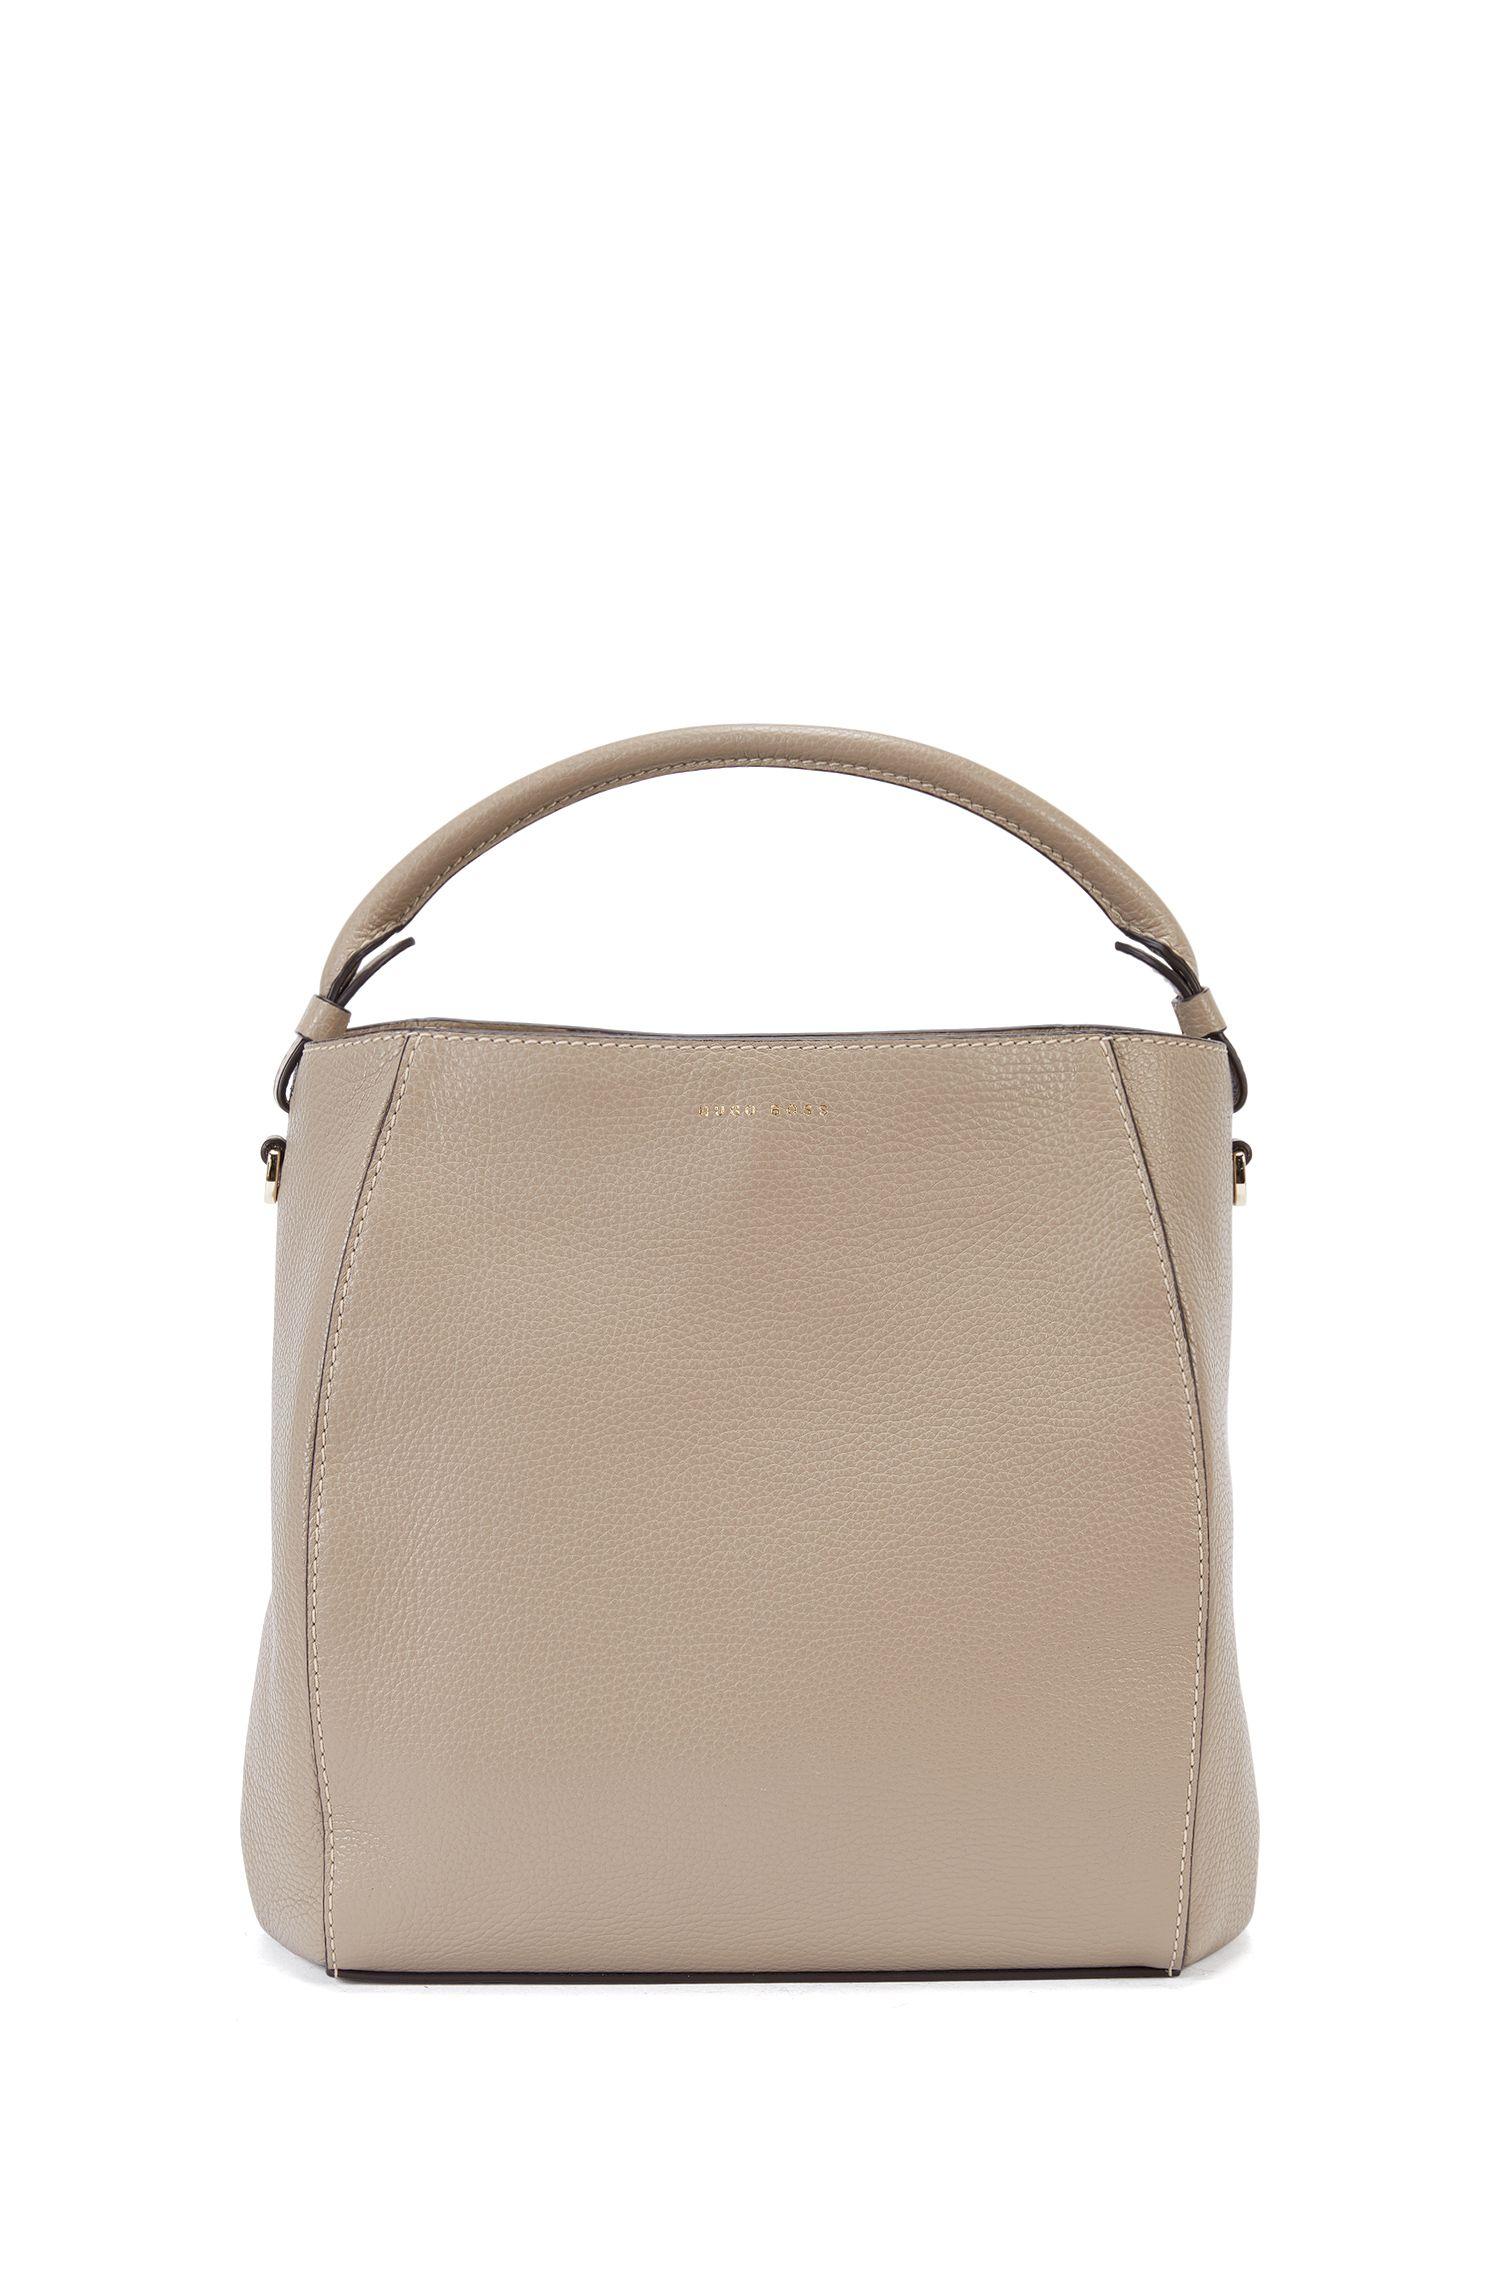 Bucket bag in rich Italian leather